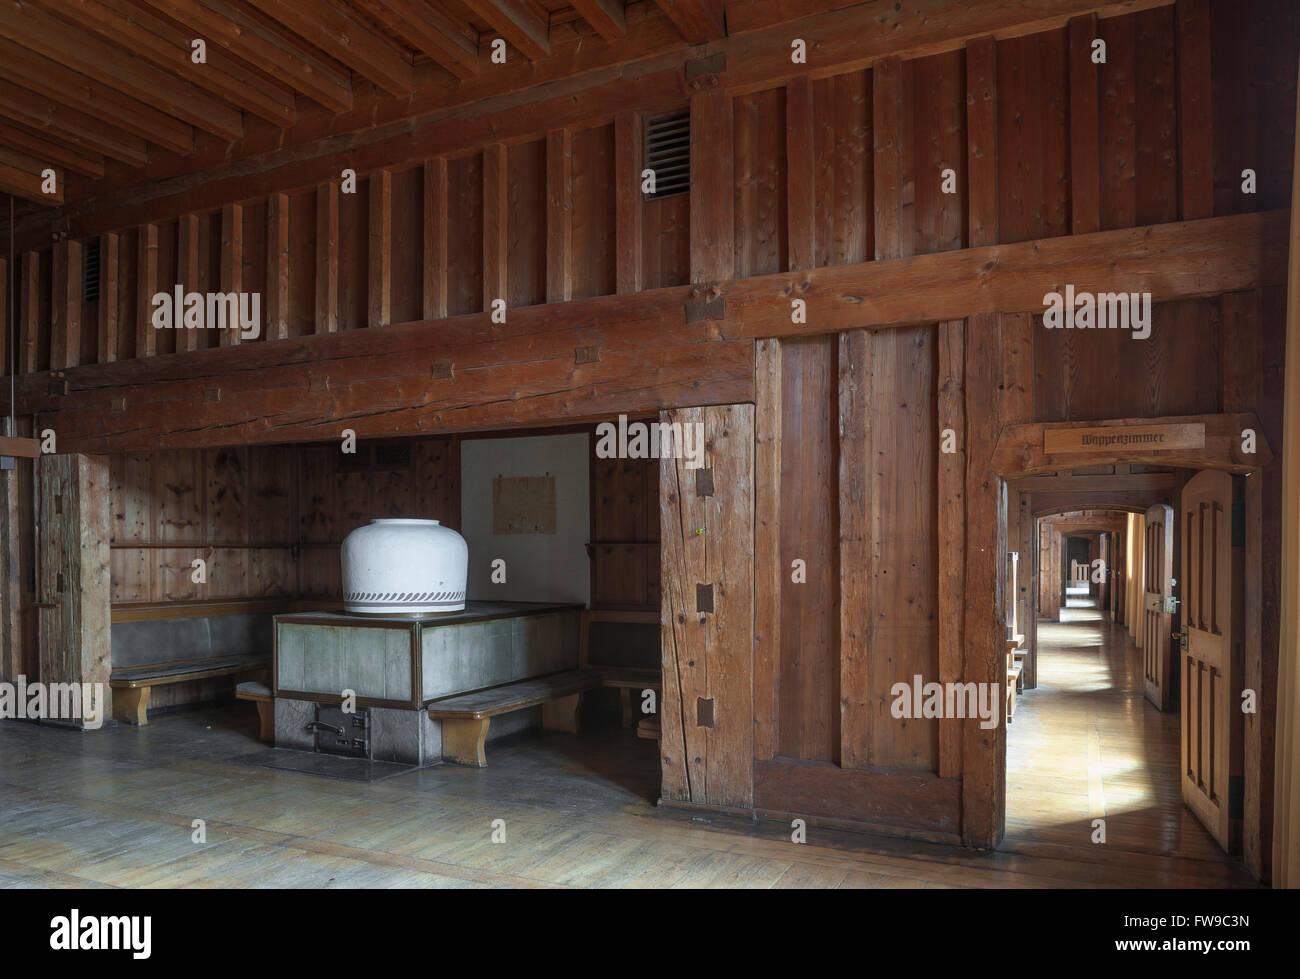 NSDAP Ordensburg Sonthofen, arquitectura, interiores Heimatschutzstil Nazi, Adolf Hitler 1935-45 centro educativo Imagen De Stock